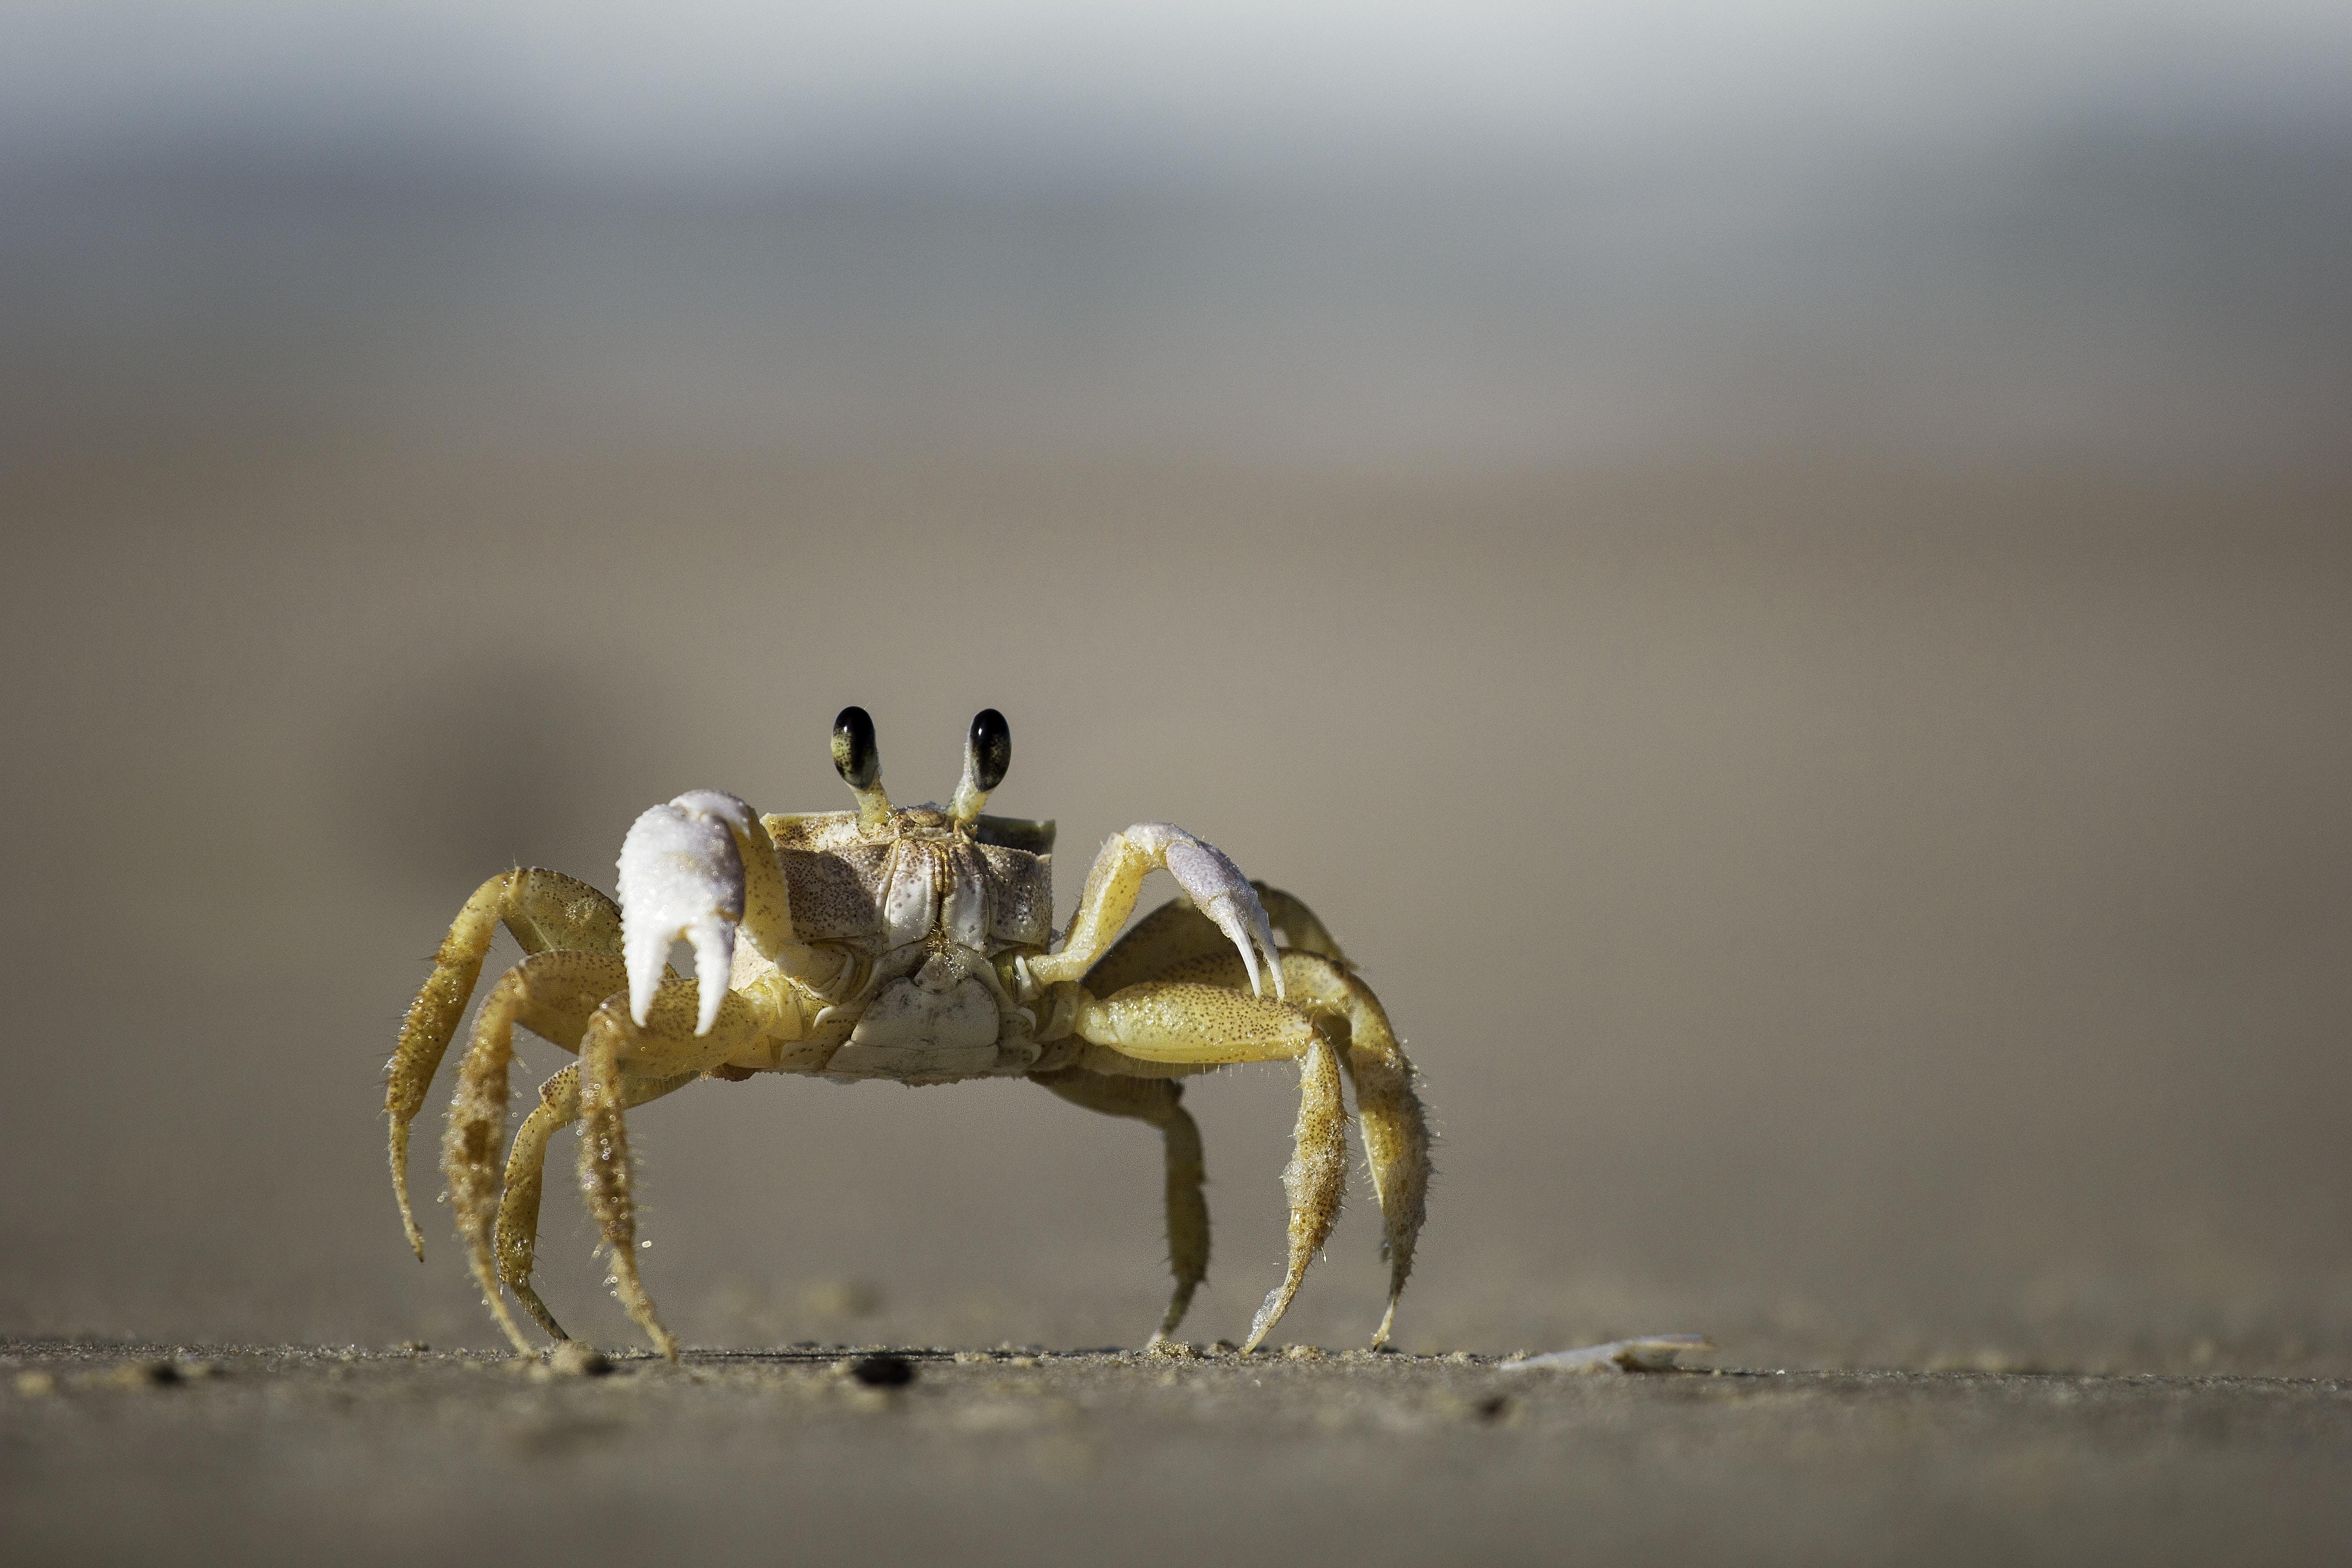 Macro shot of a fiddler crab on a sand beach at Barra da Lagoa